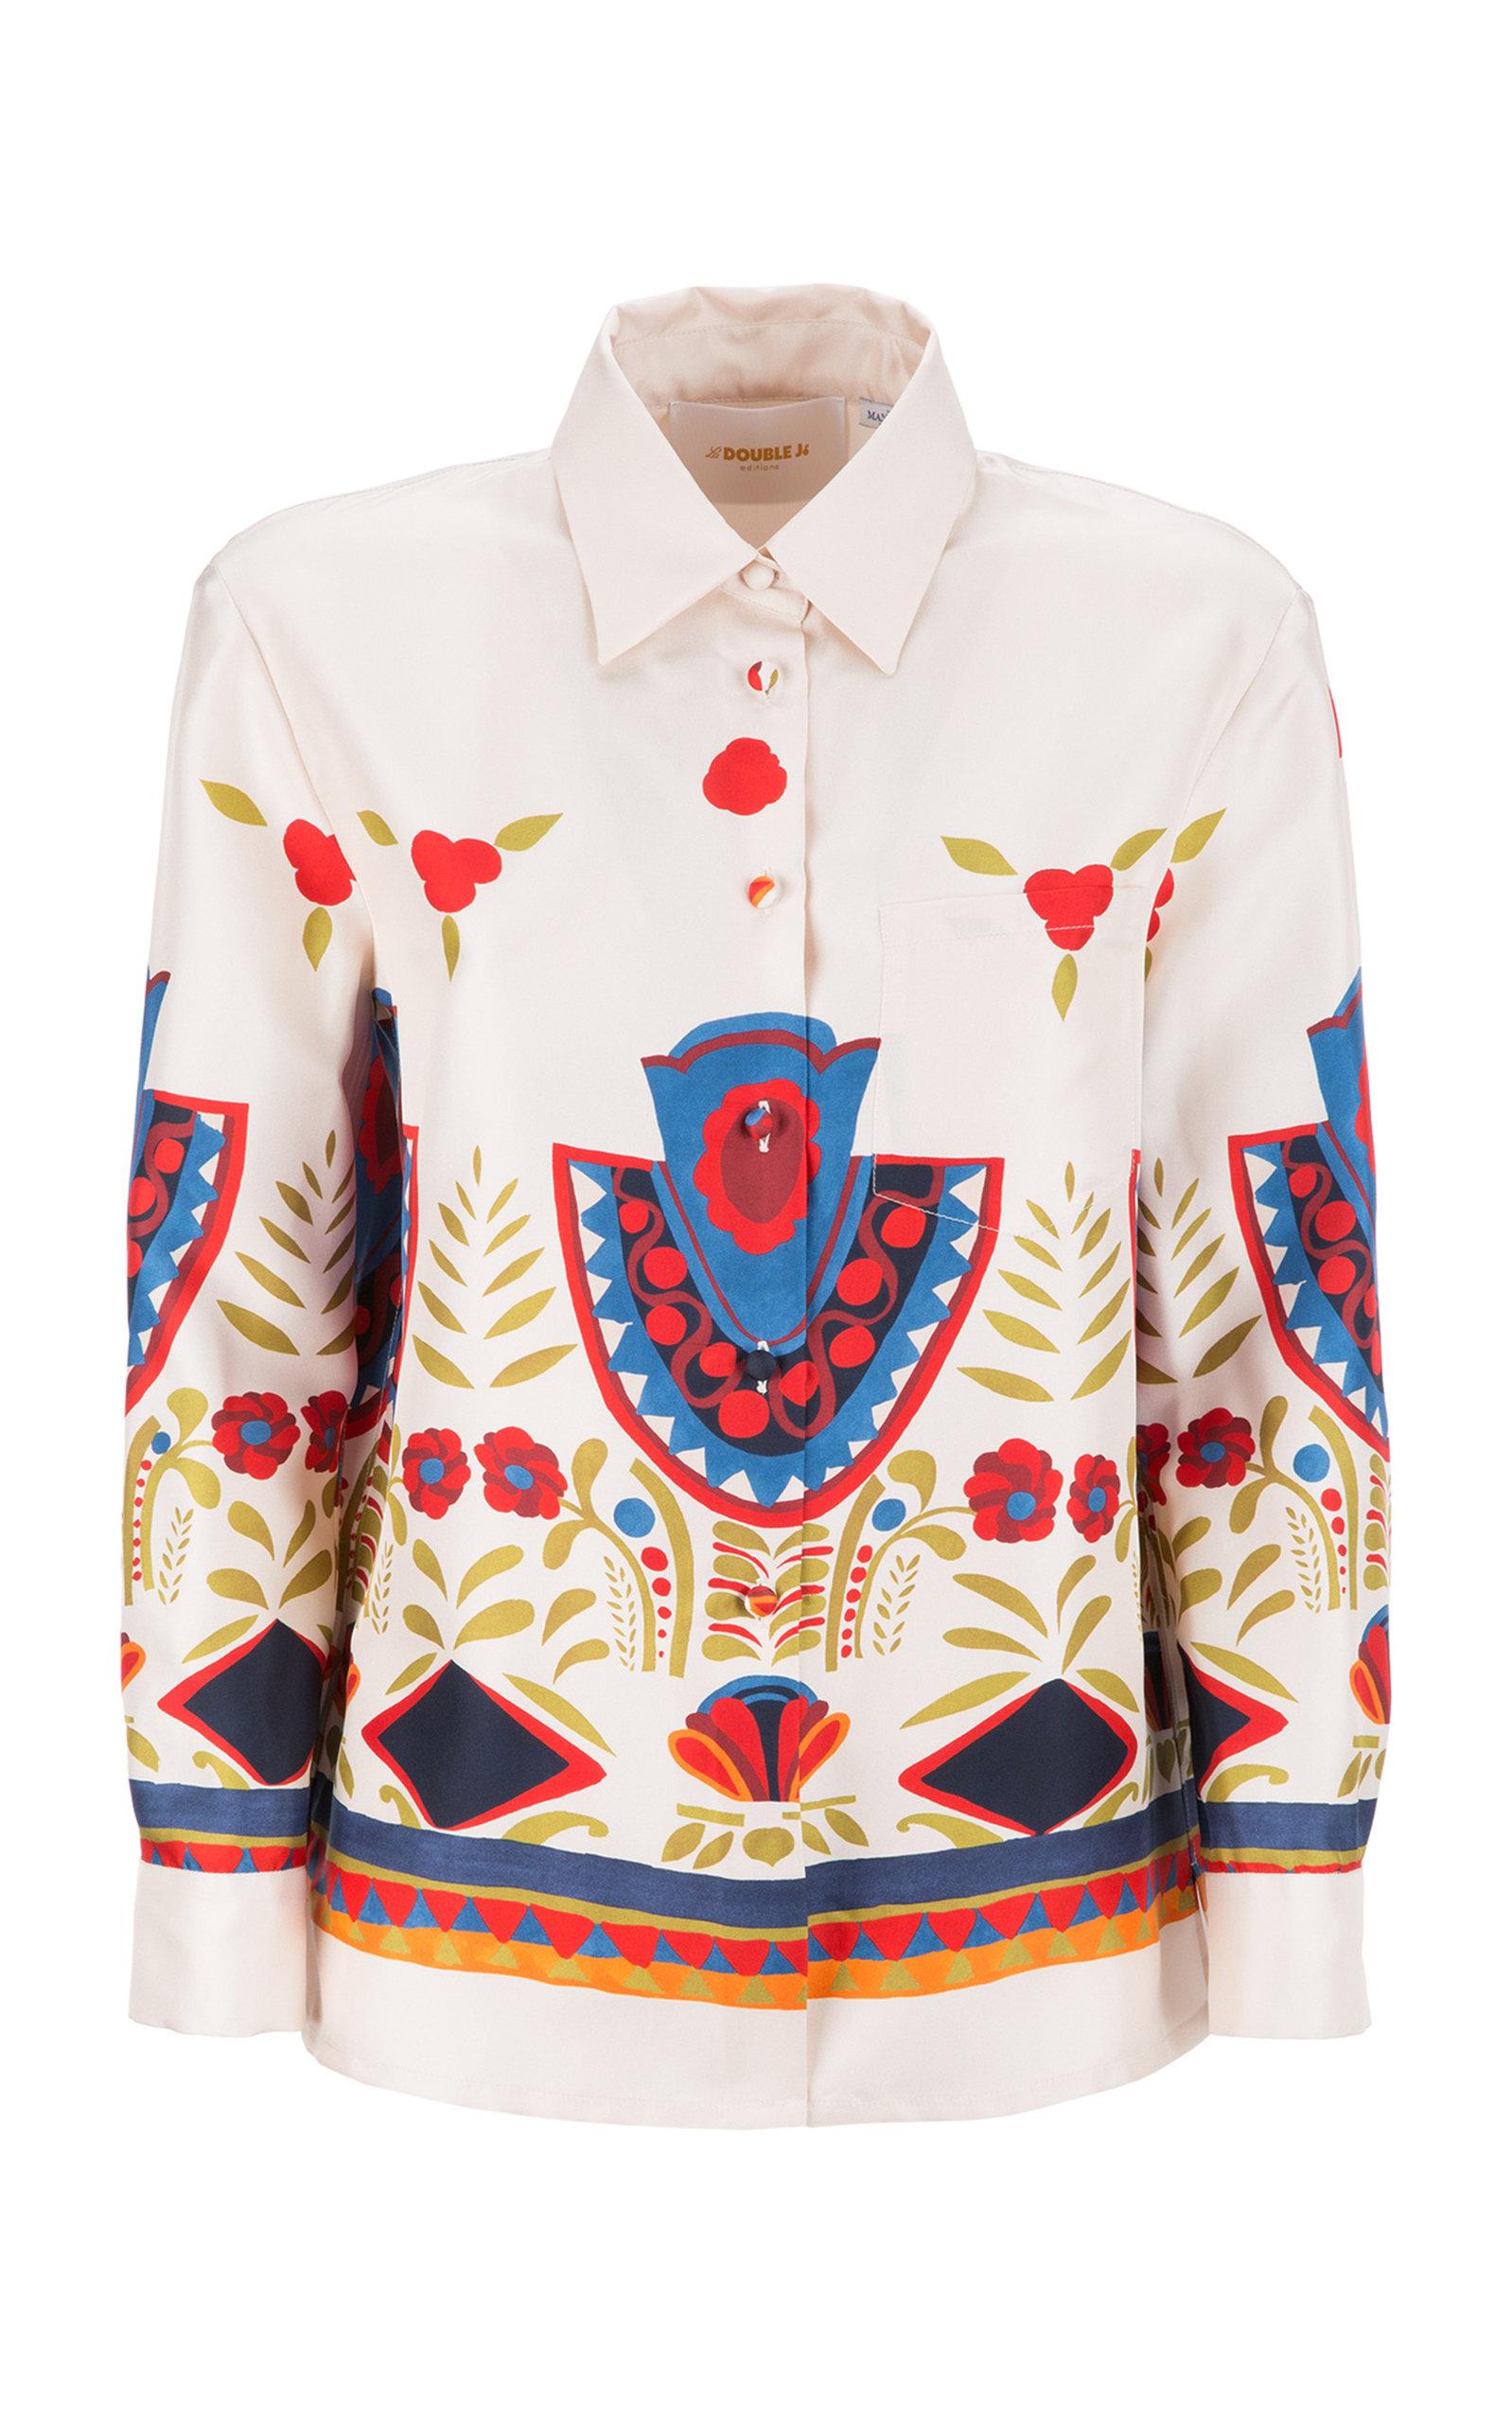 LA DOUBLEJ Printed New Boy Shirt  in Neutrals